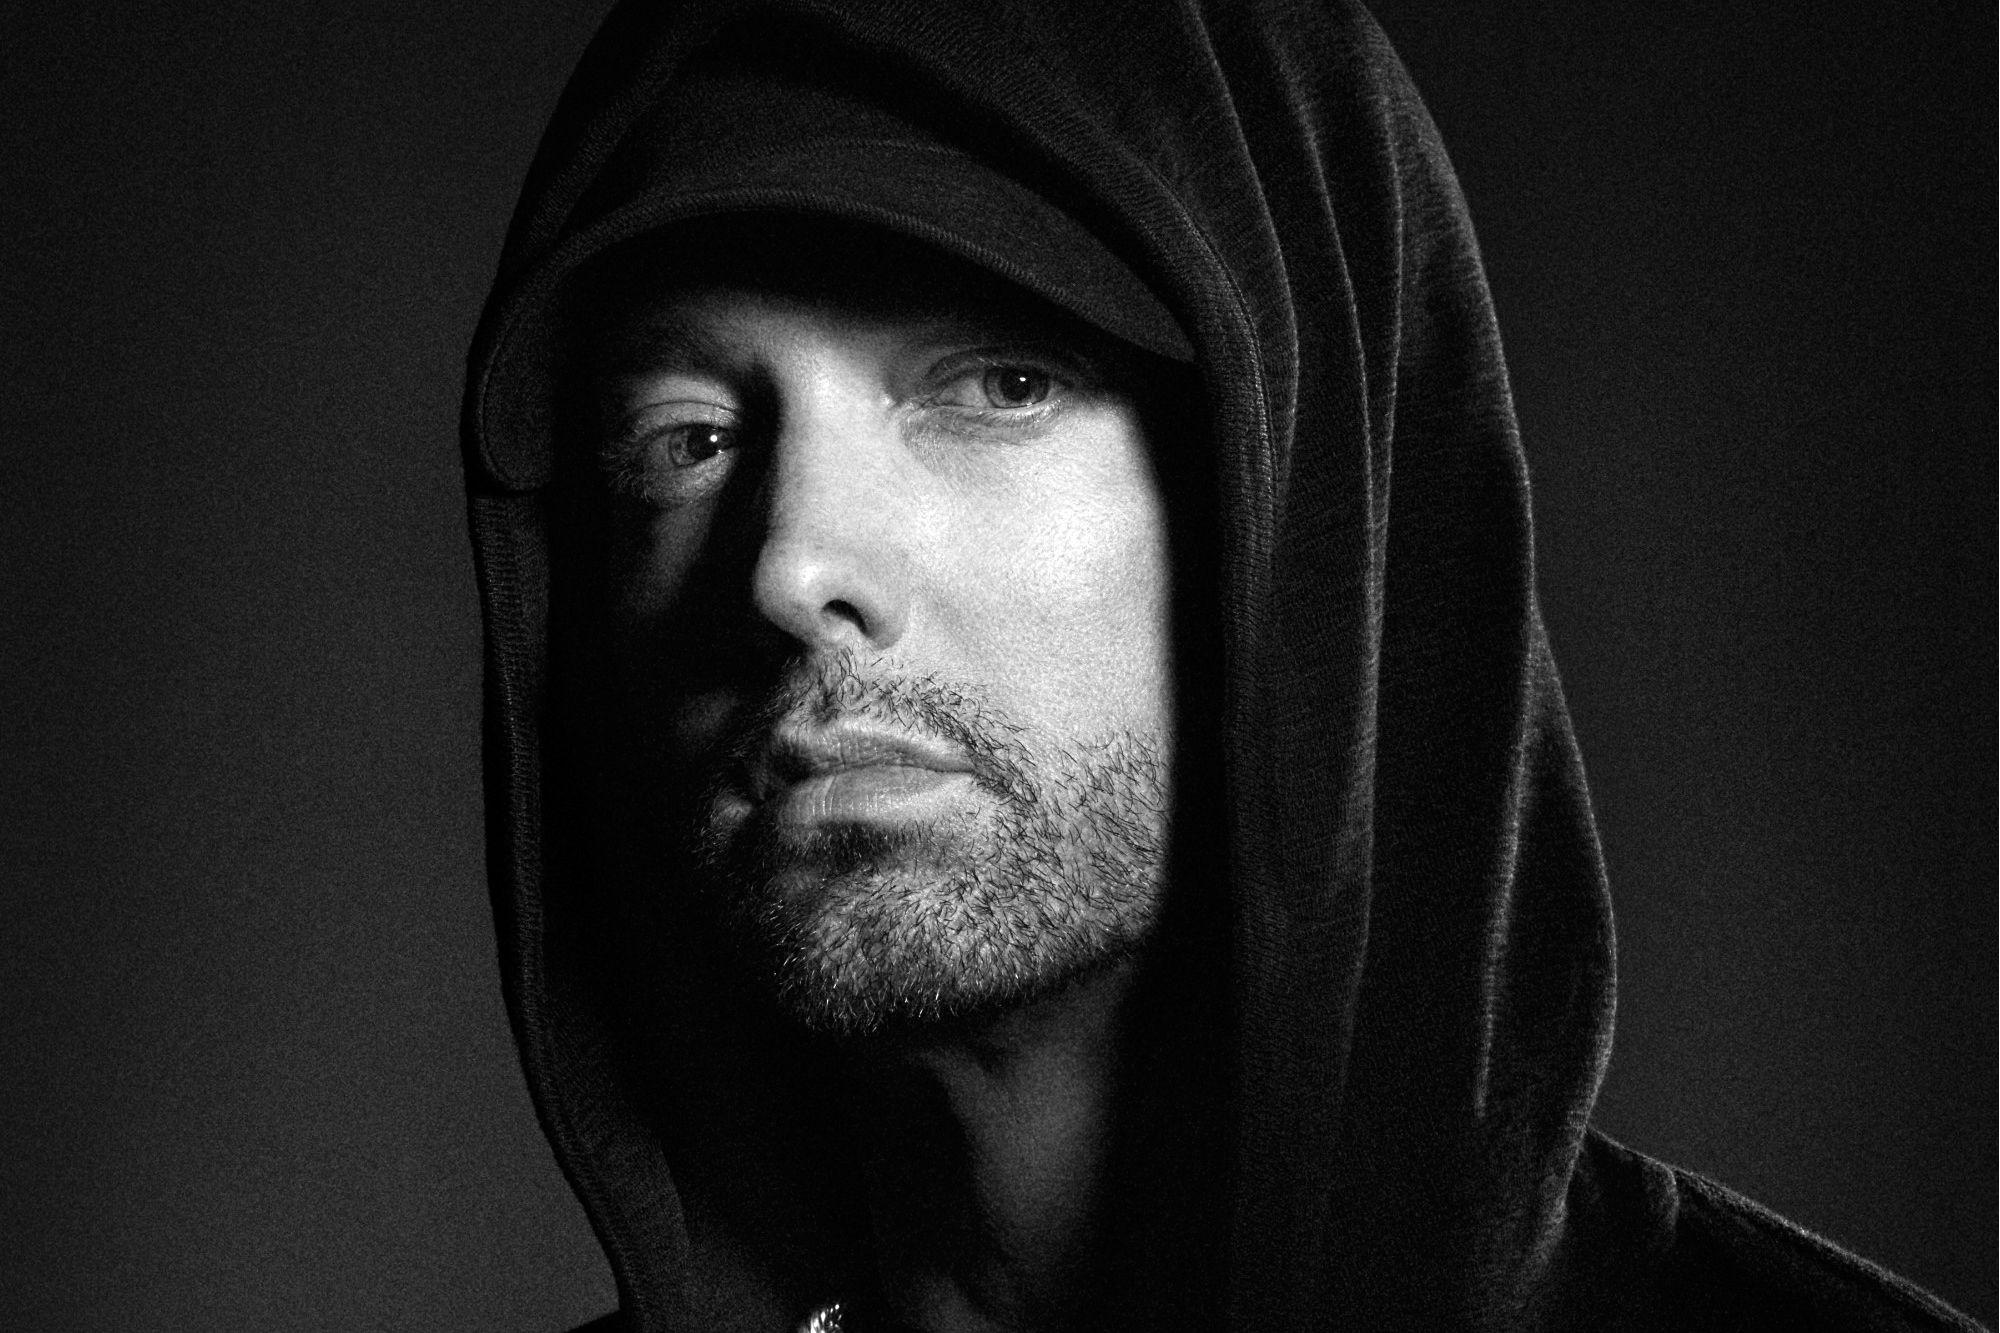 KAMIKAZE: Eminem vuelve a las raíces - Radio Cantilo